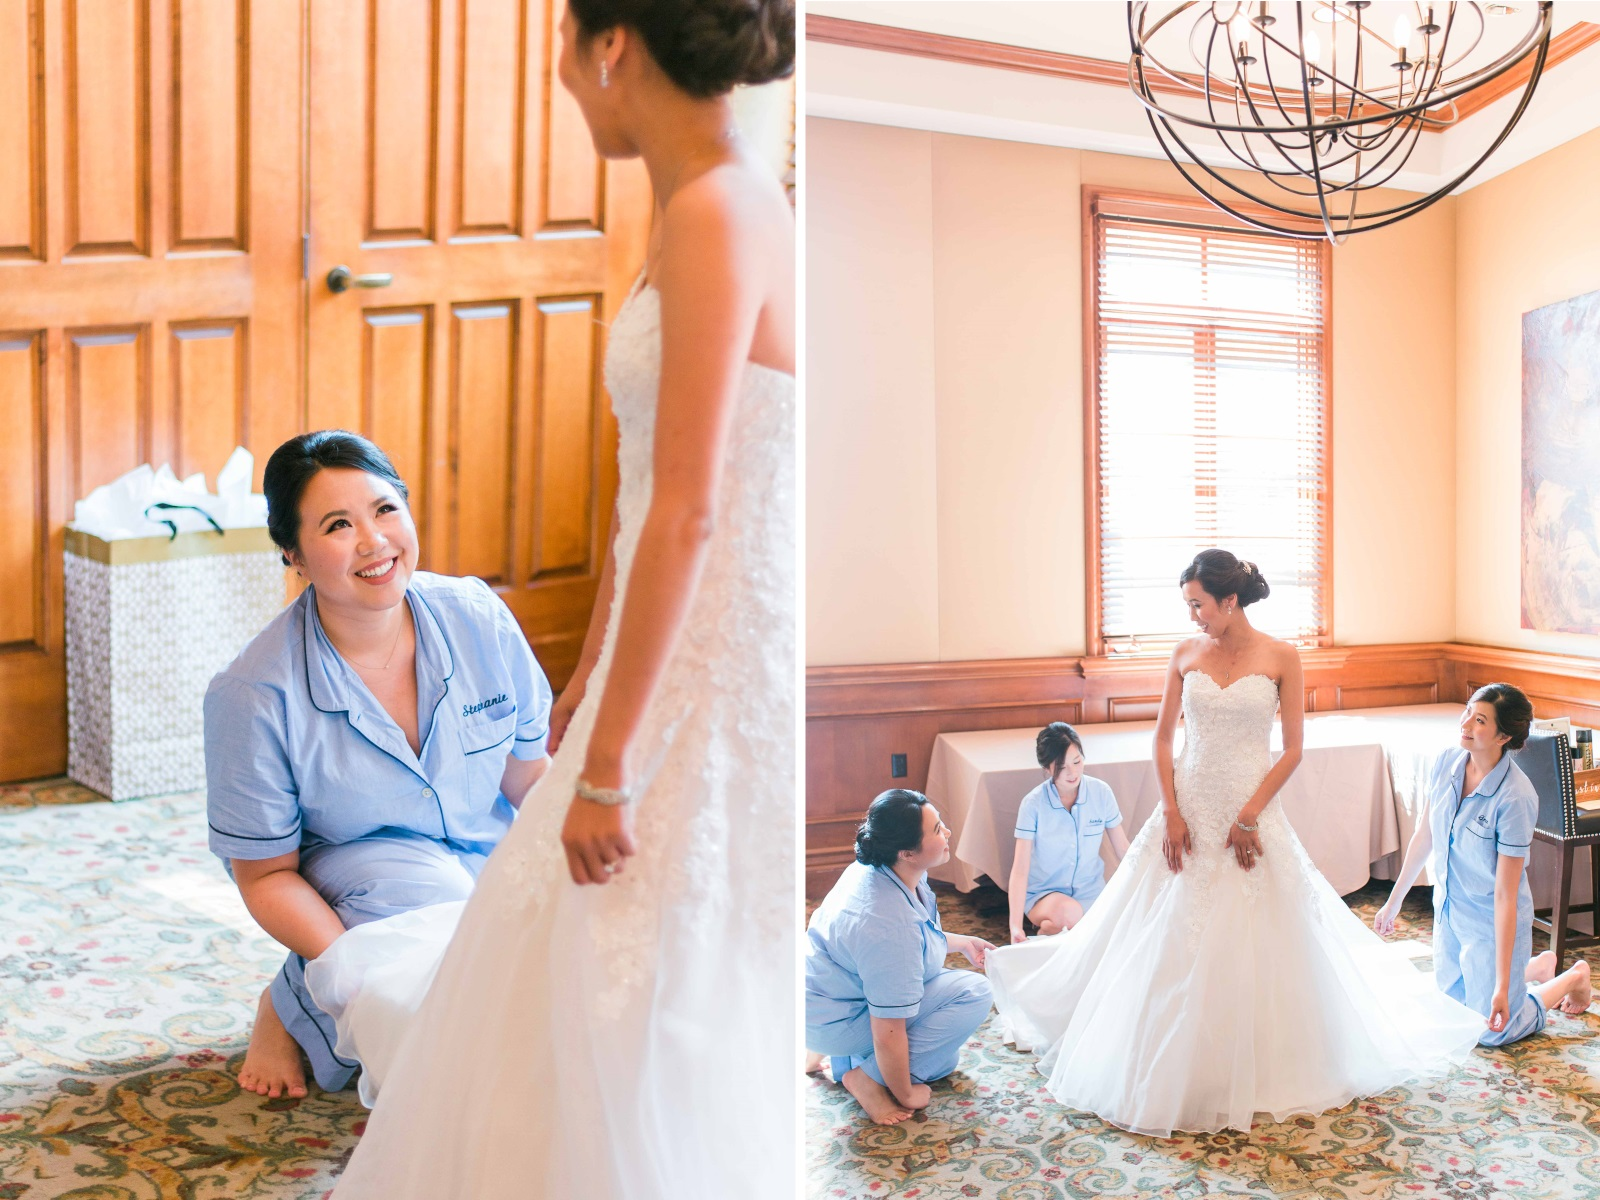 Ruby Hill Wedding Photos by JBJ Pictures - San Francisco Wedding Photographer - Pleasanton Wedding Venue (9.1).jpg